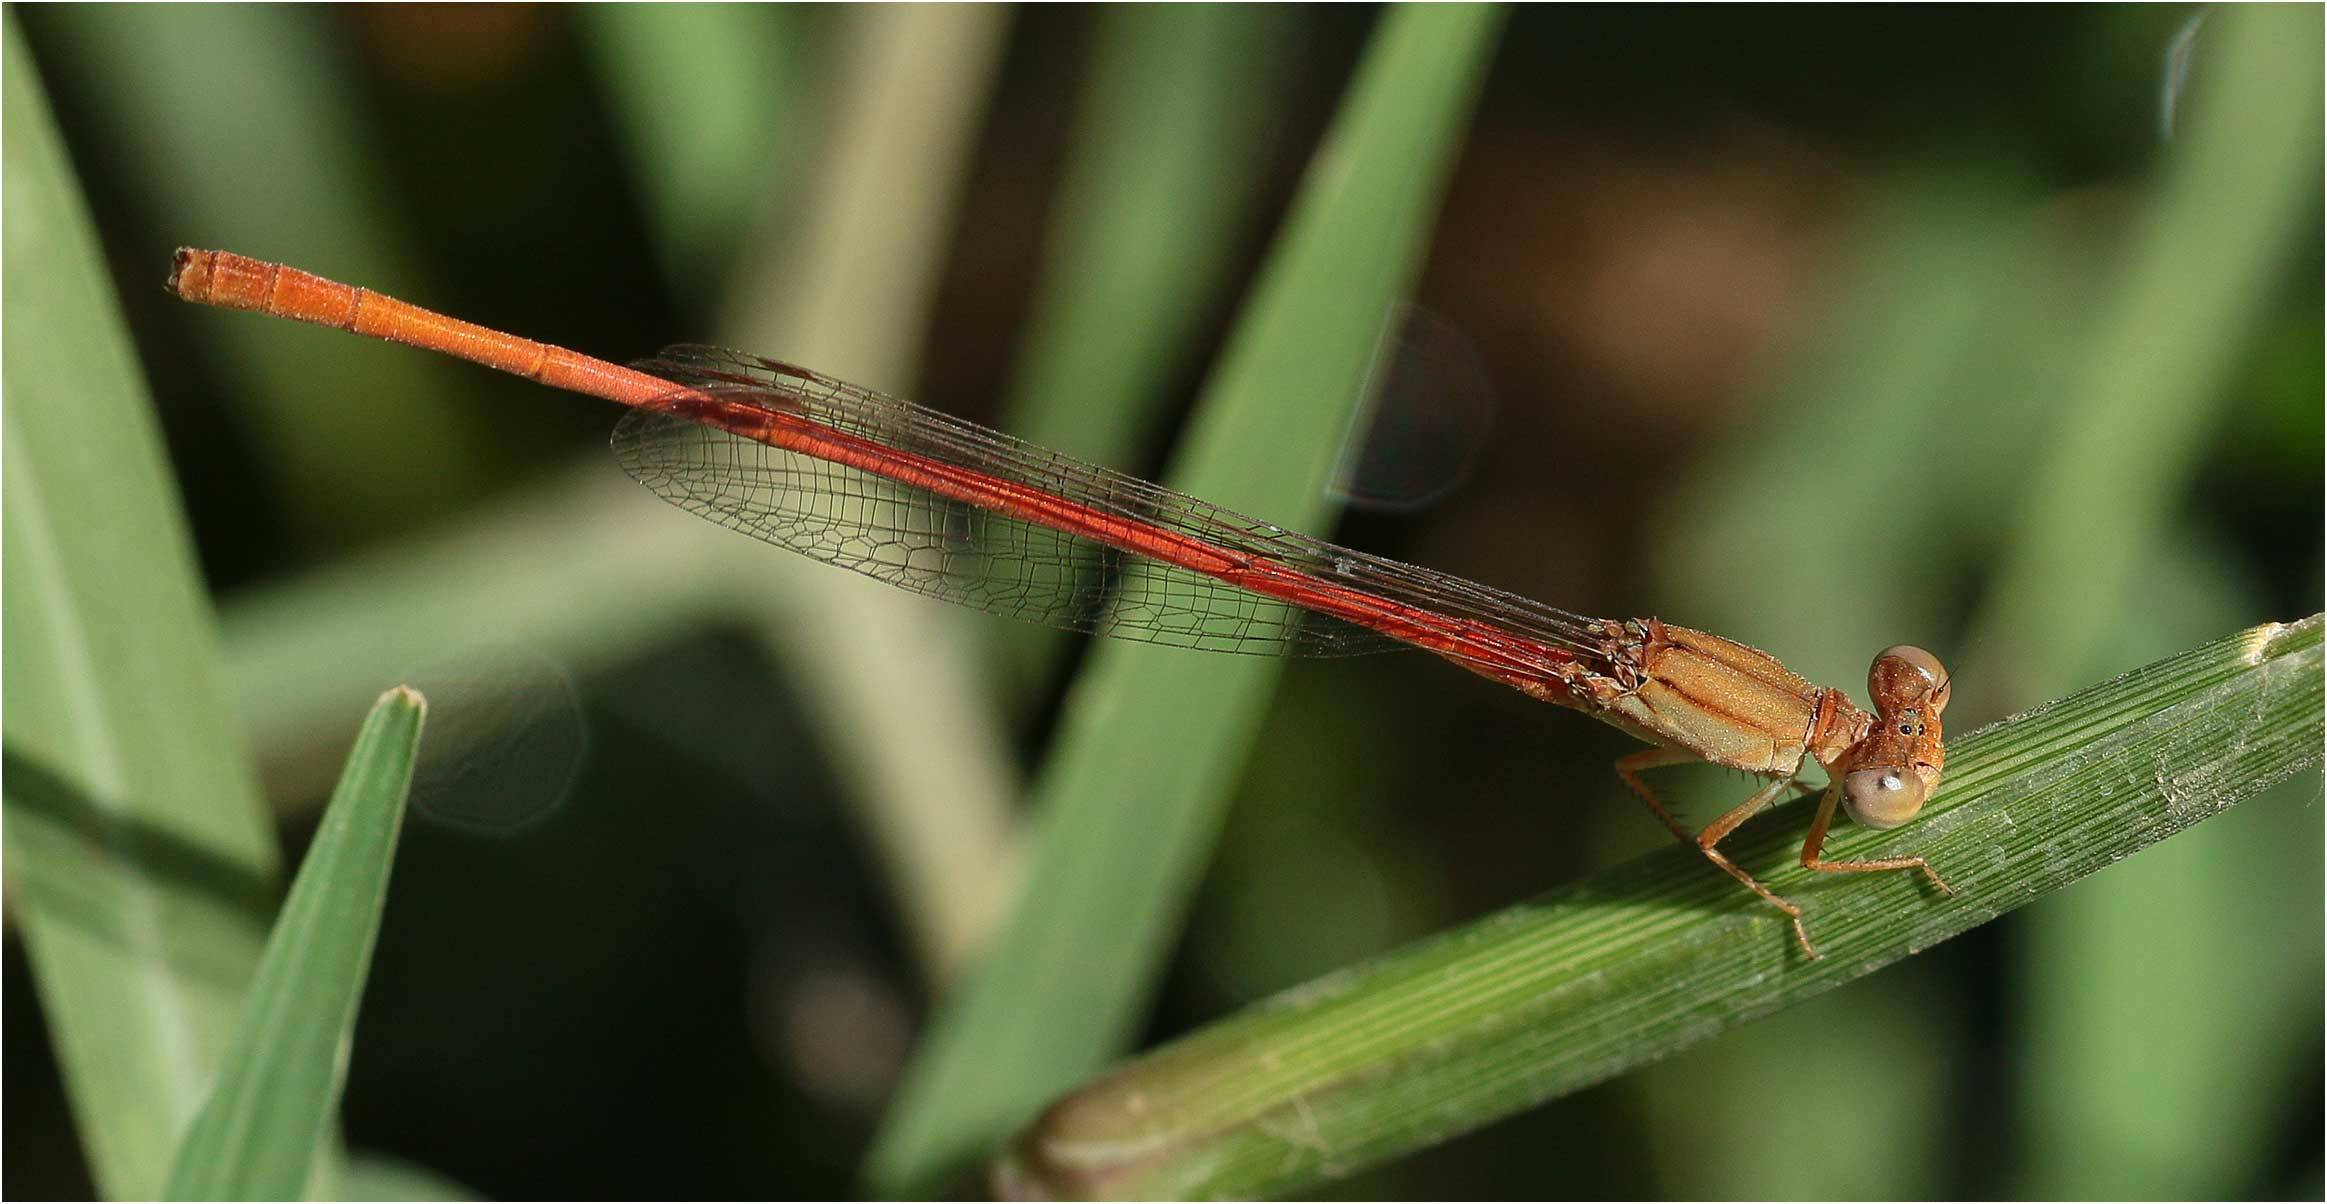 Ceriagrion glabrum, Ethiopie, lac Awash, 01/11/2018